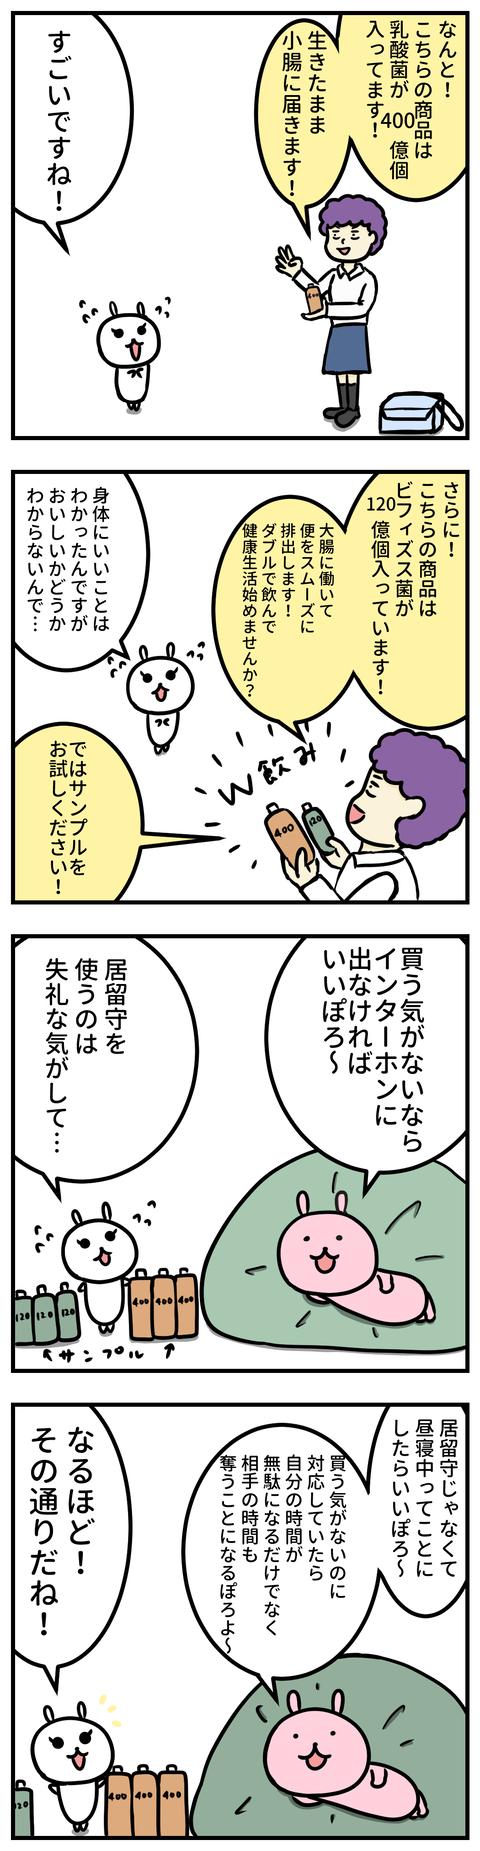 manga-yuzuporo41-1